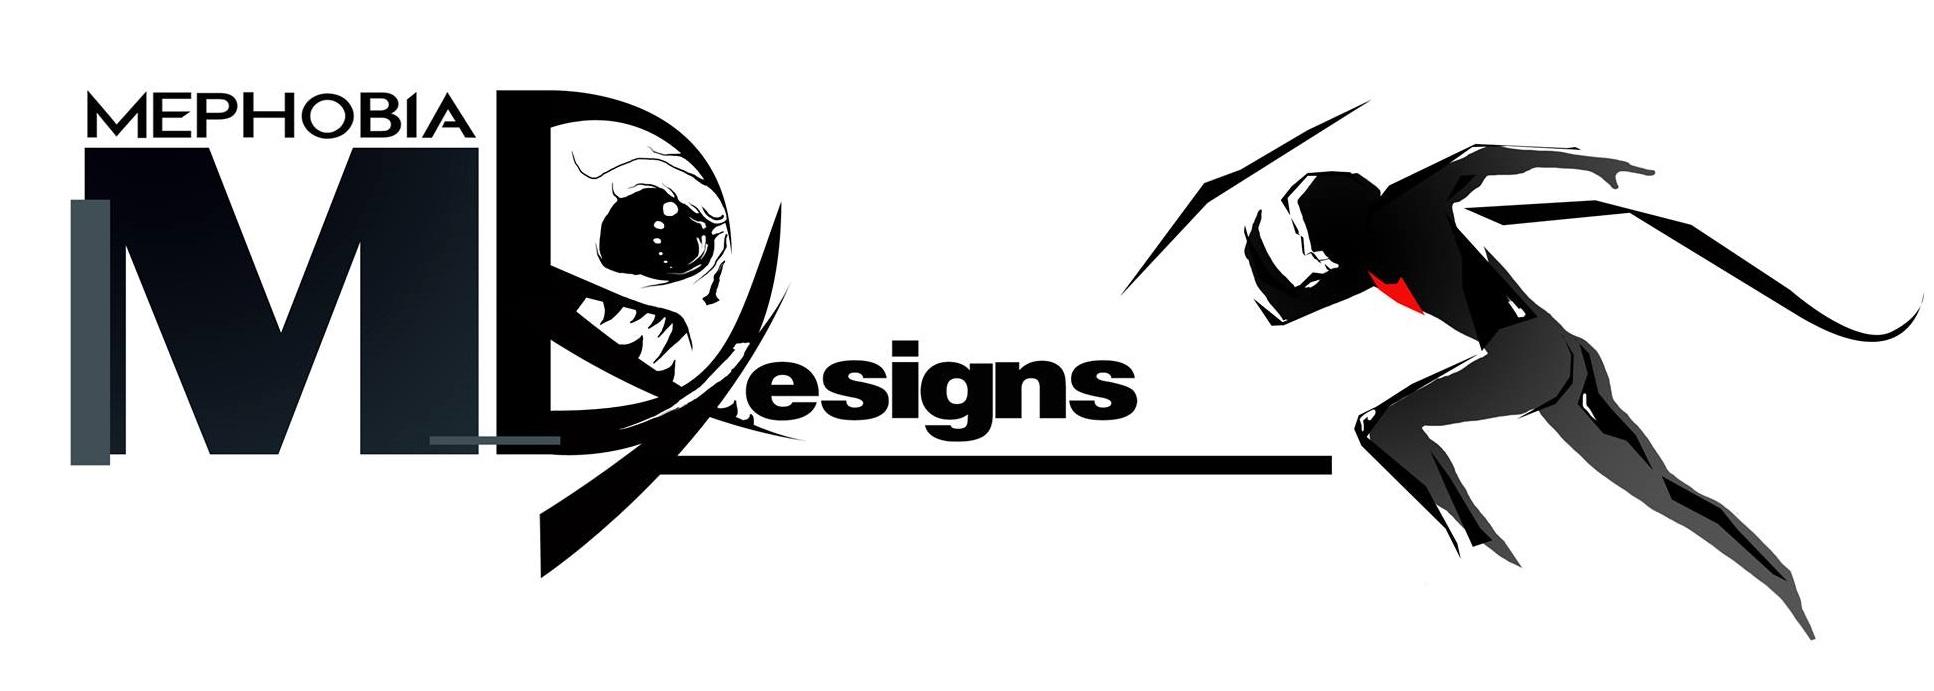 Mephobia Designs